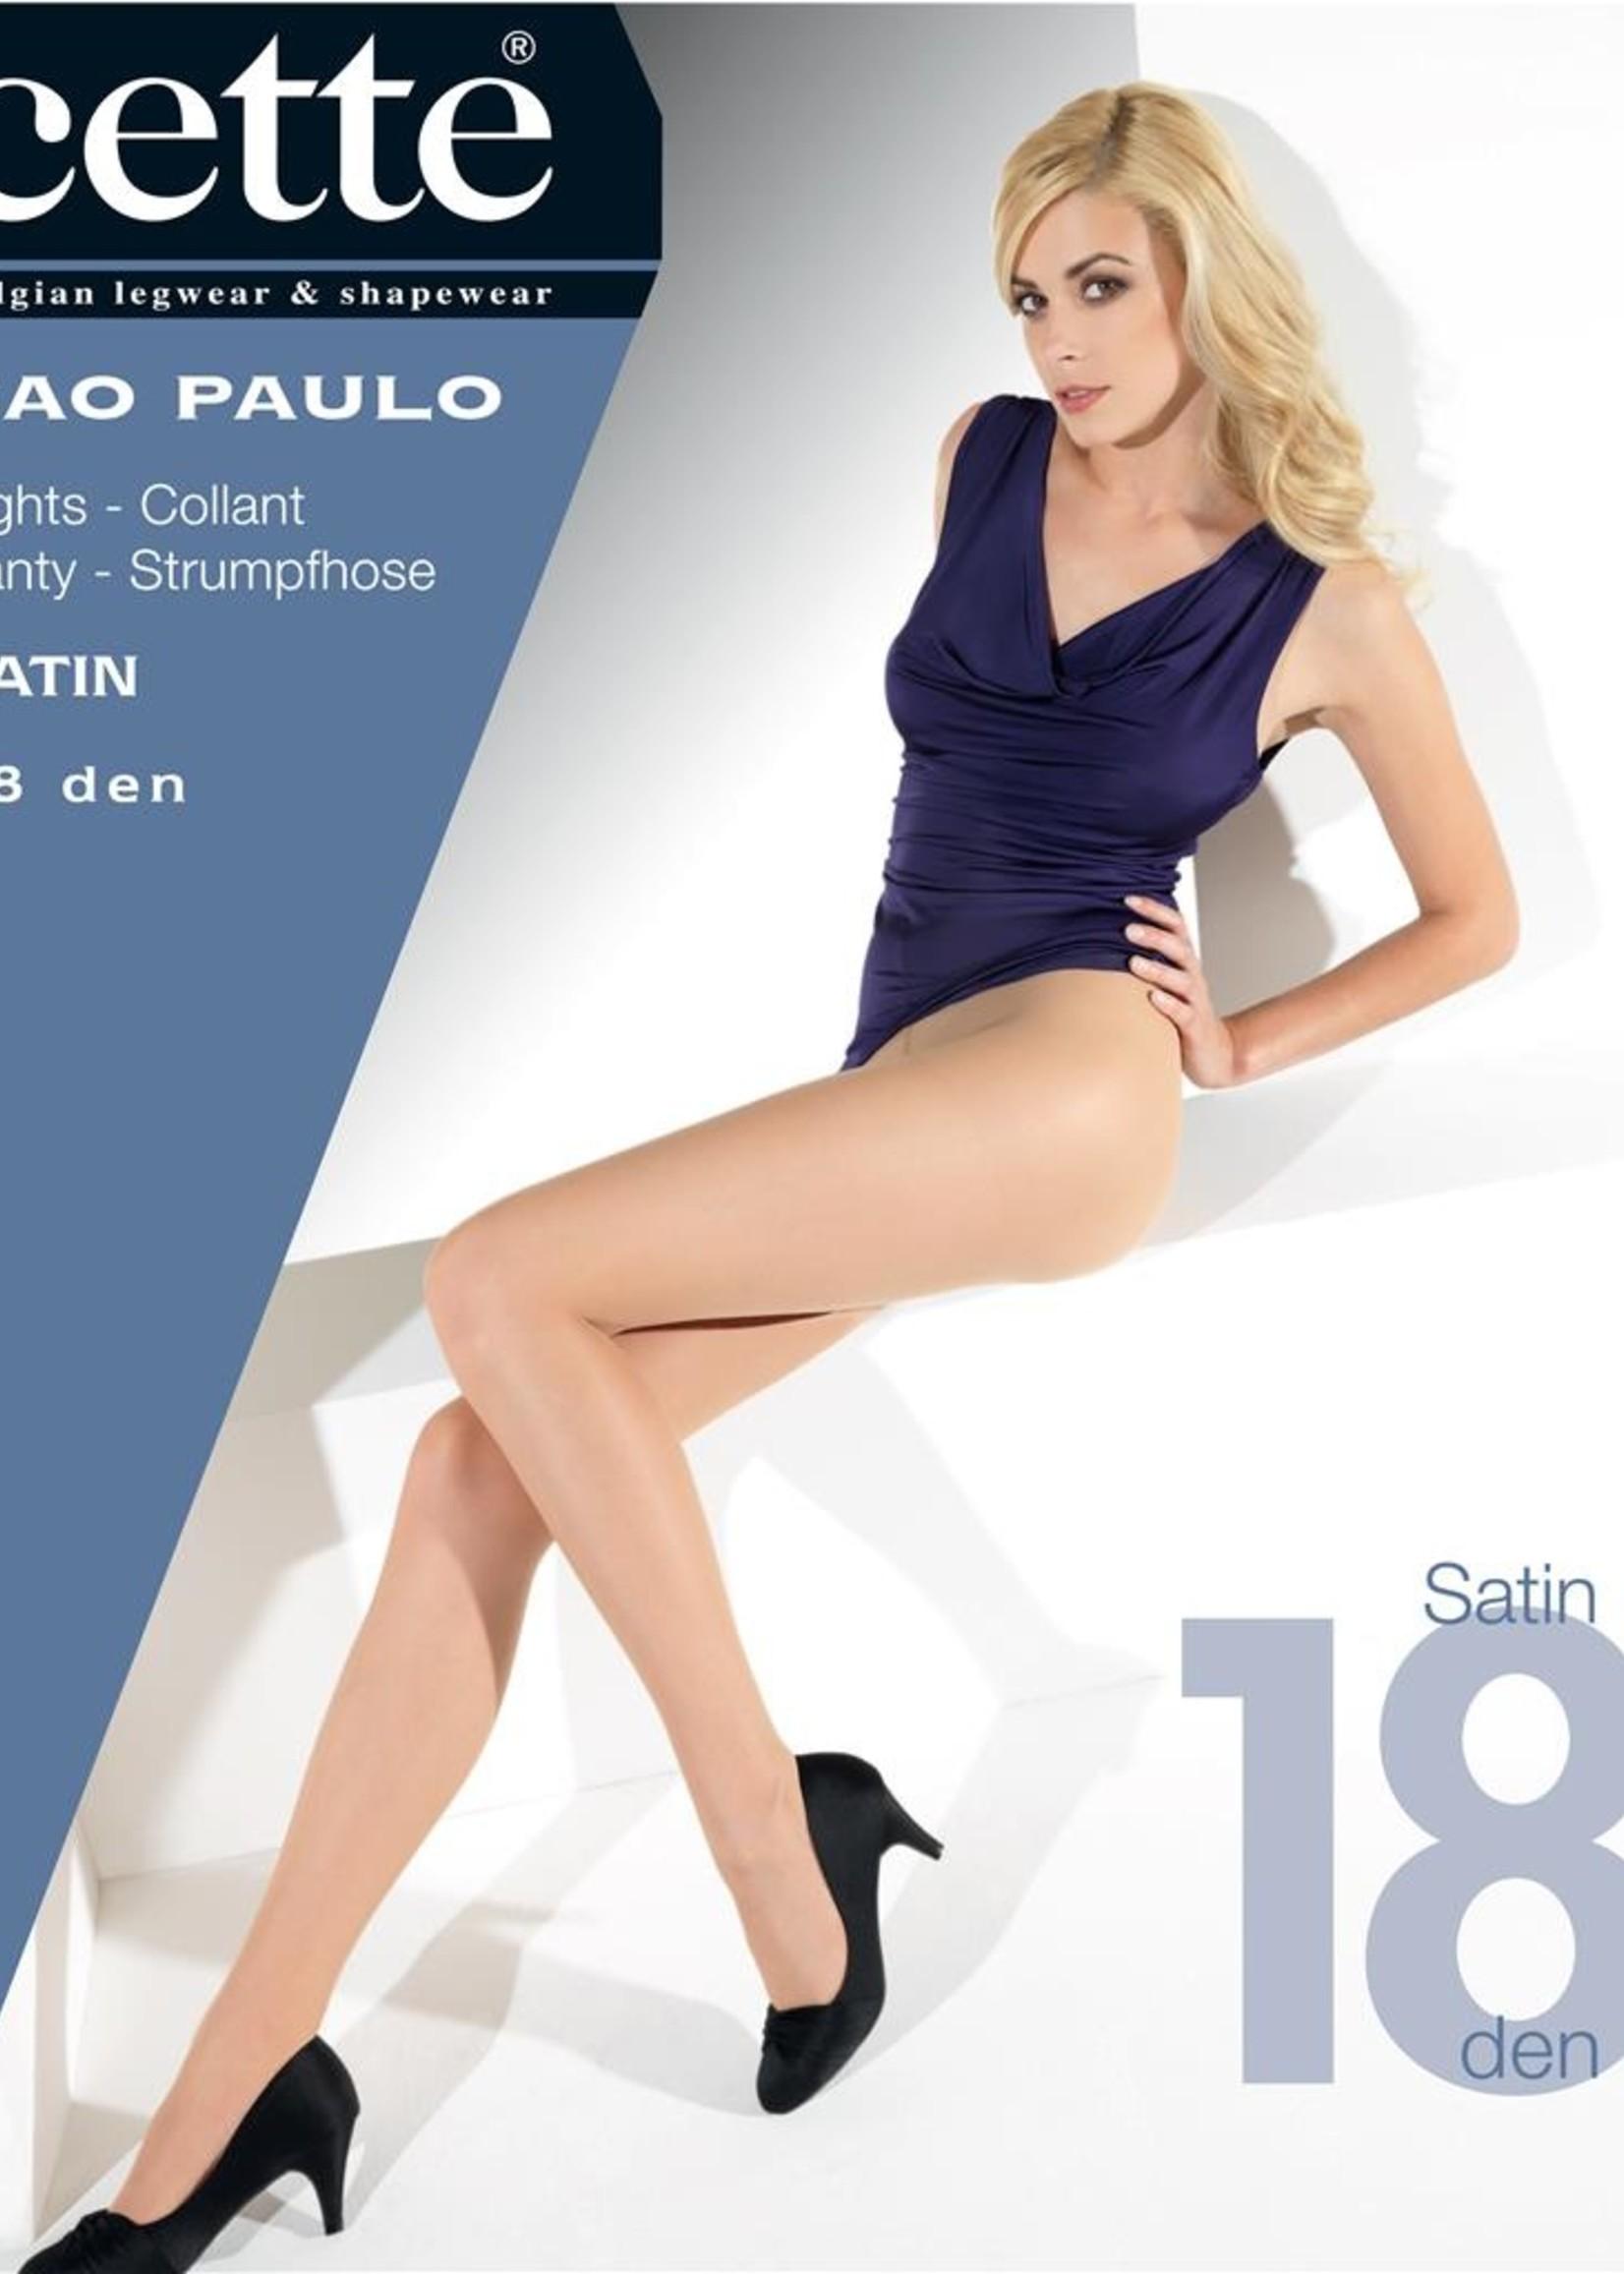 Cette Cette Sao Paulo Panty